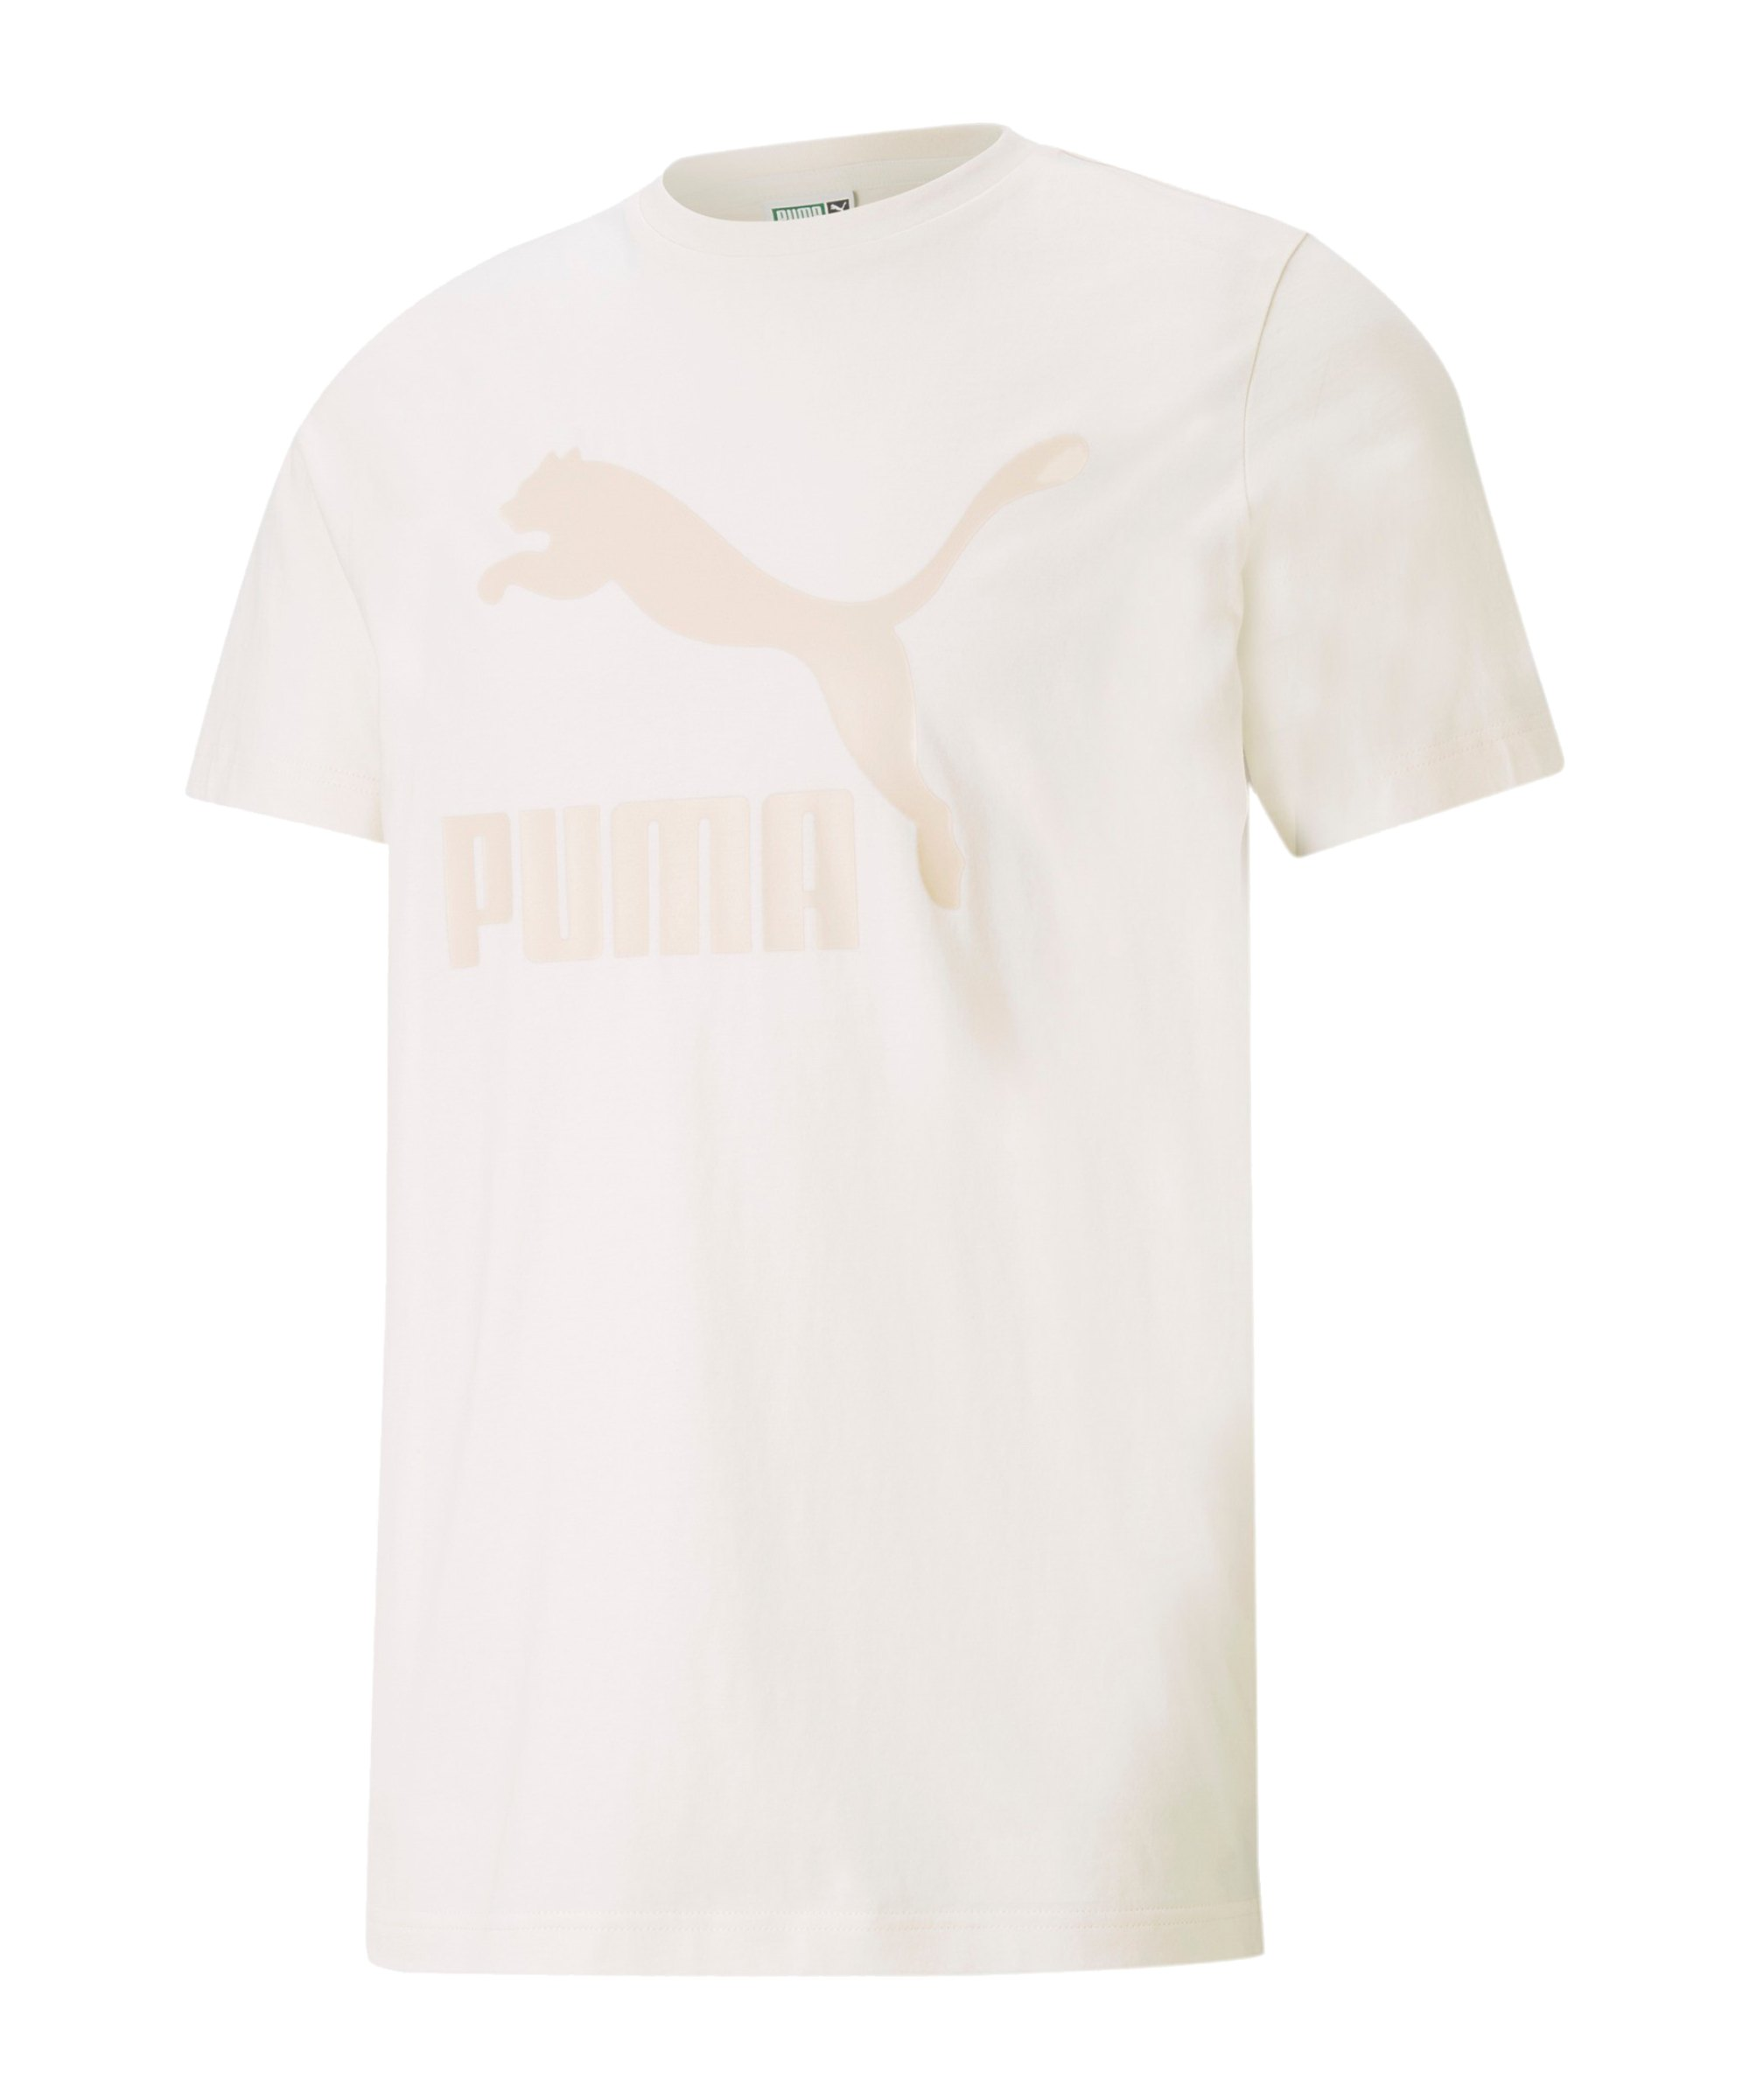 PUMA Classic Logo T-Shirt F99 - weiss